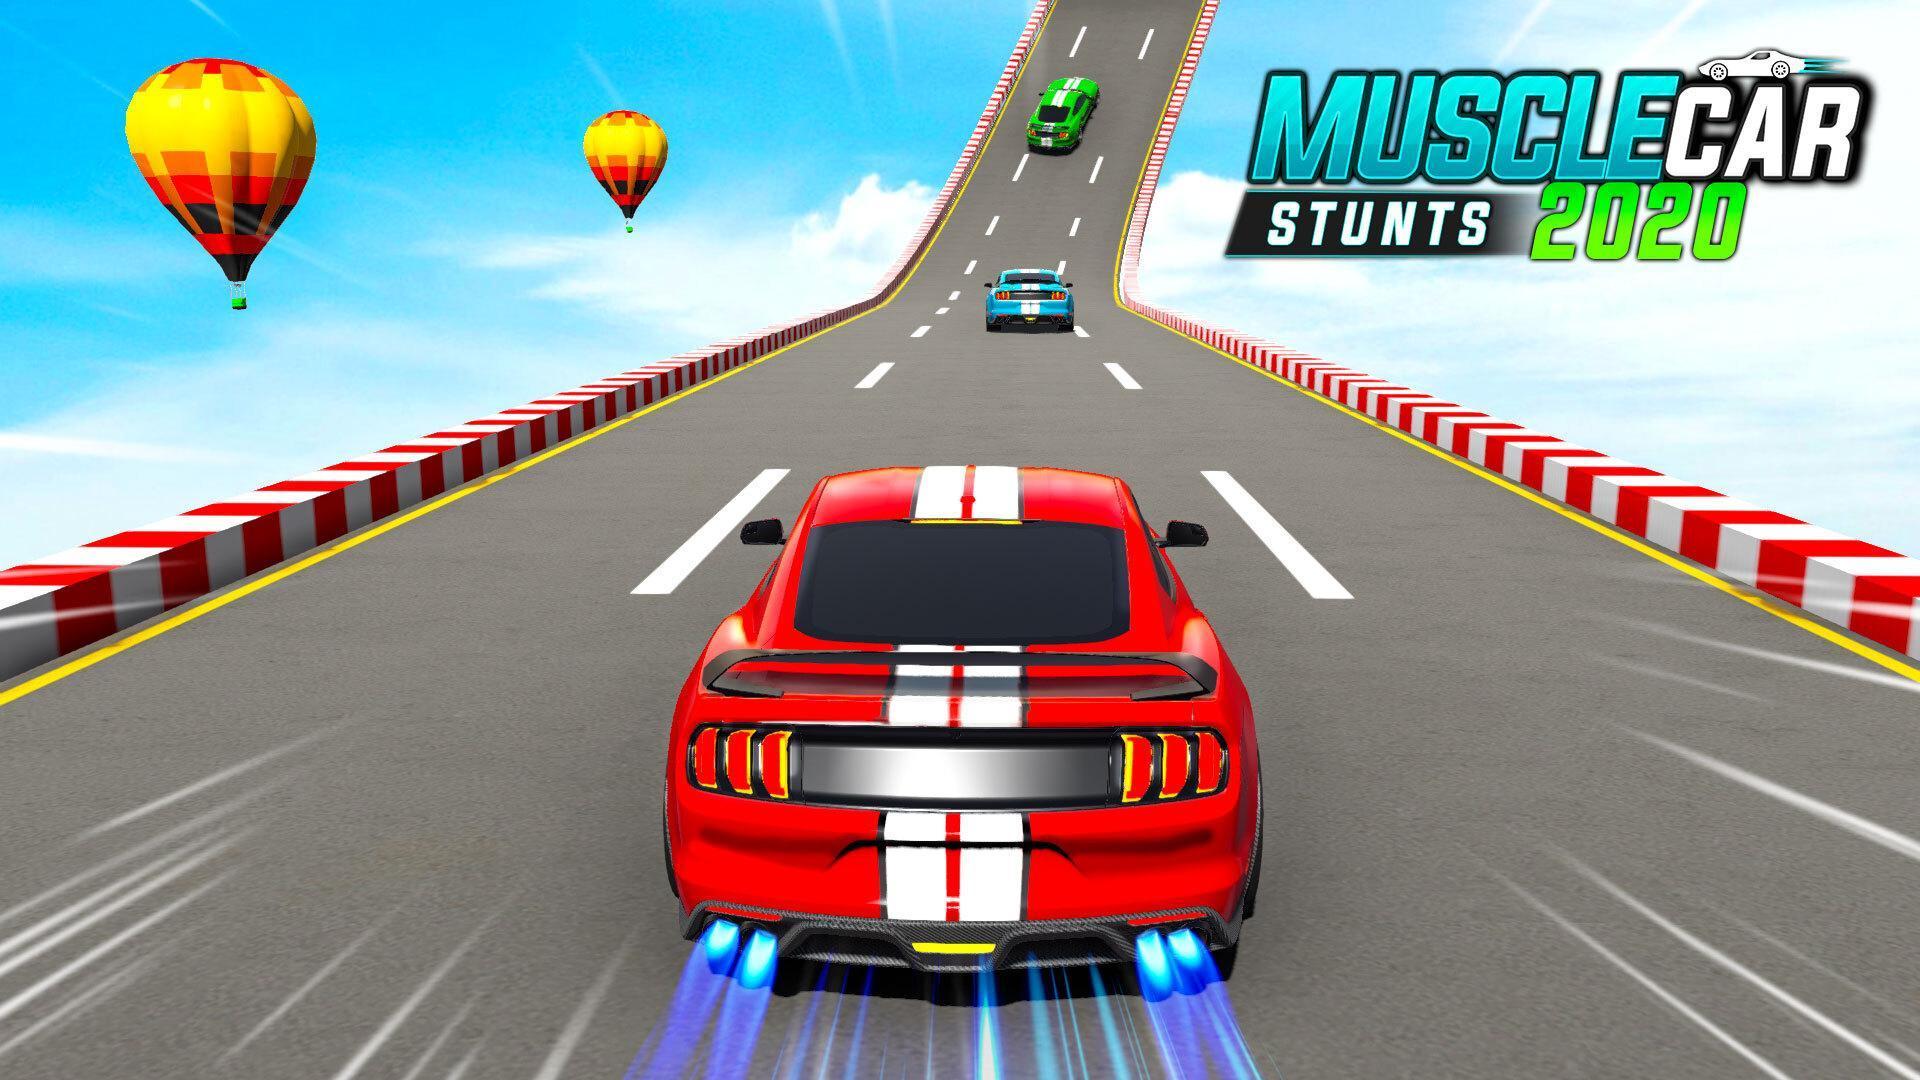 Muscle Car Stunts 2020 Mega Ramp Stunt Car Games 1.0.9 Screenshot 1